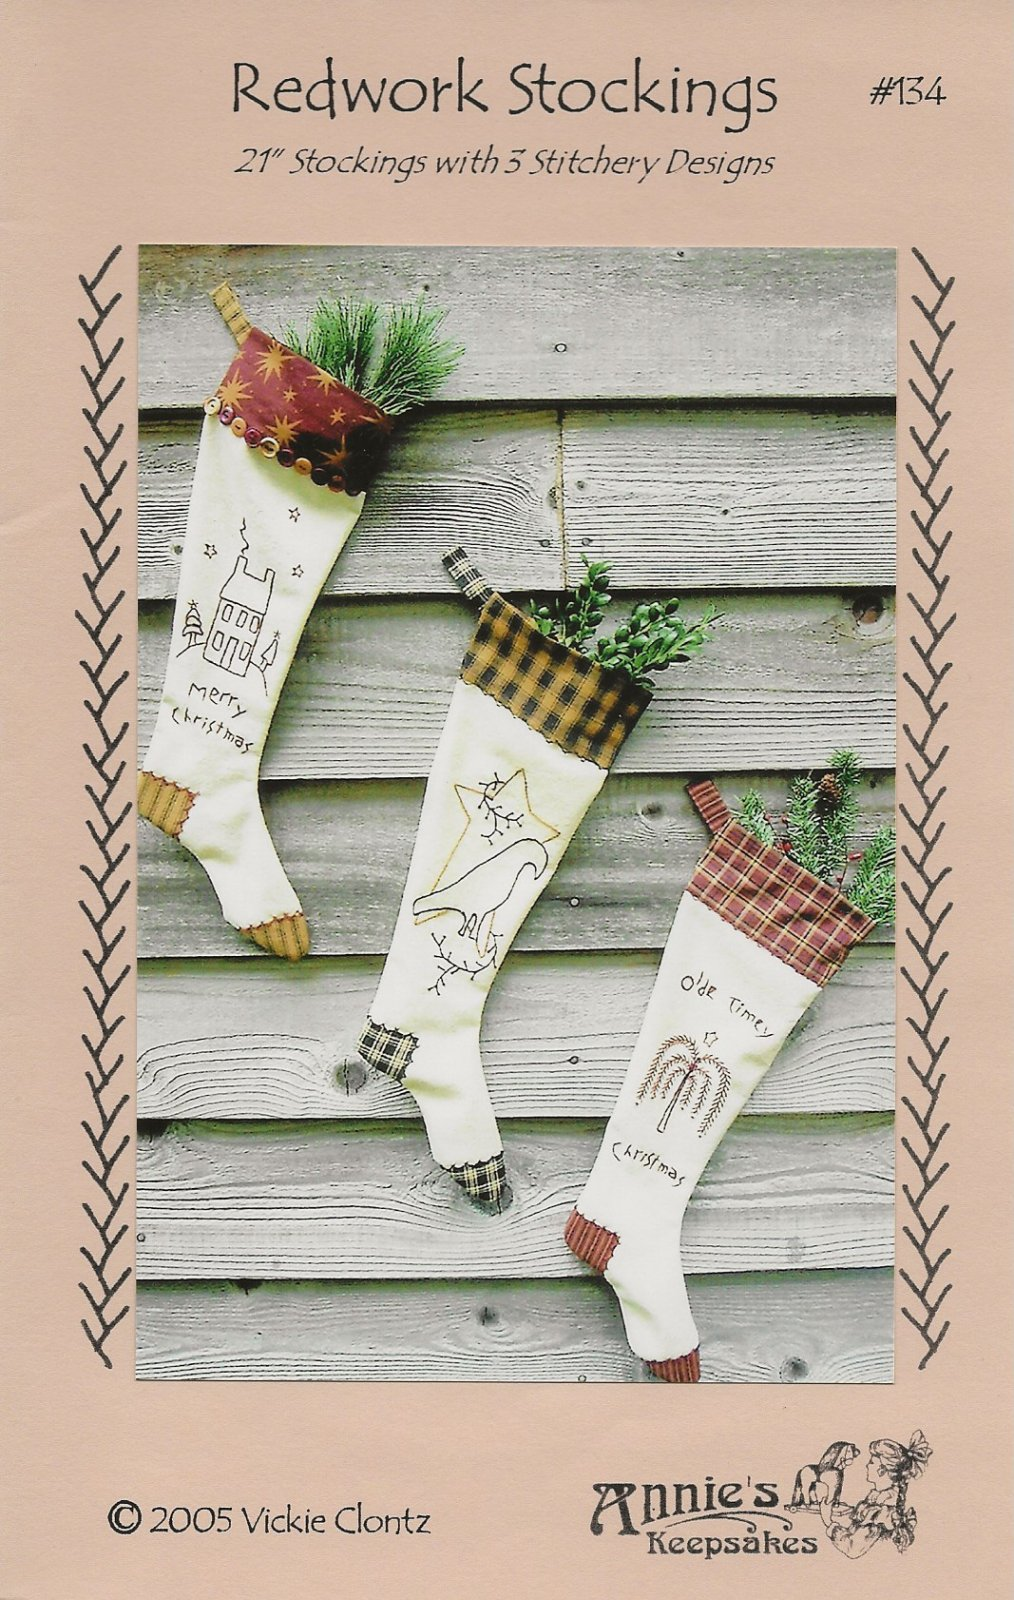 Redwork Stockings